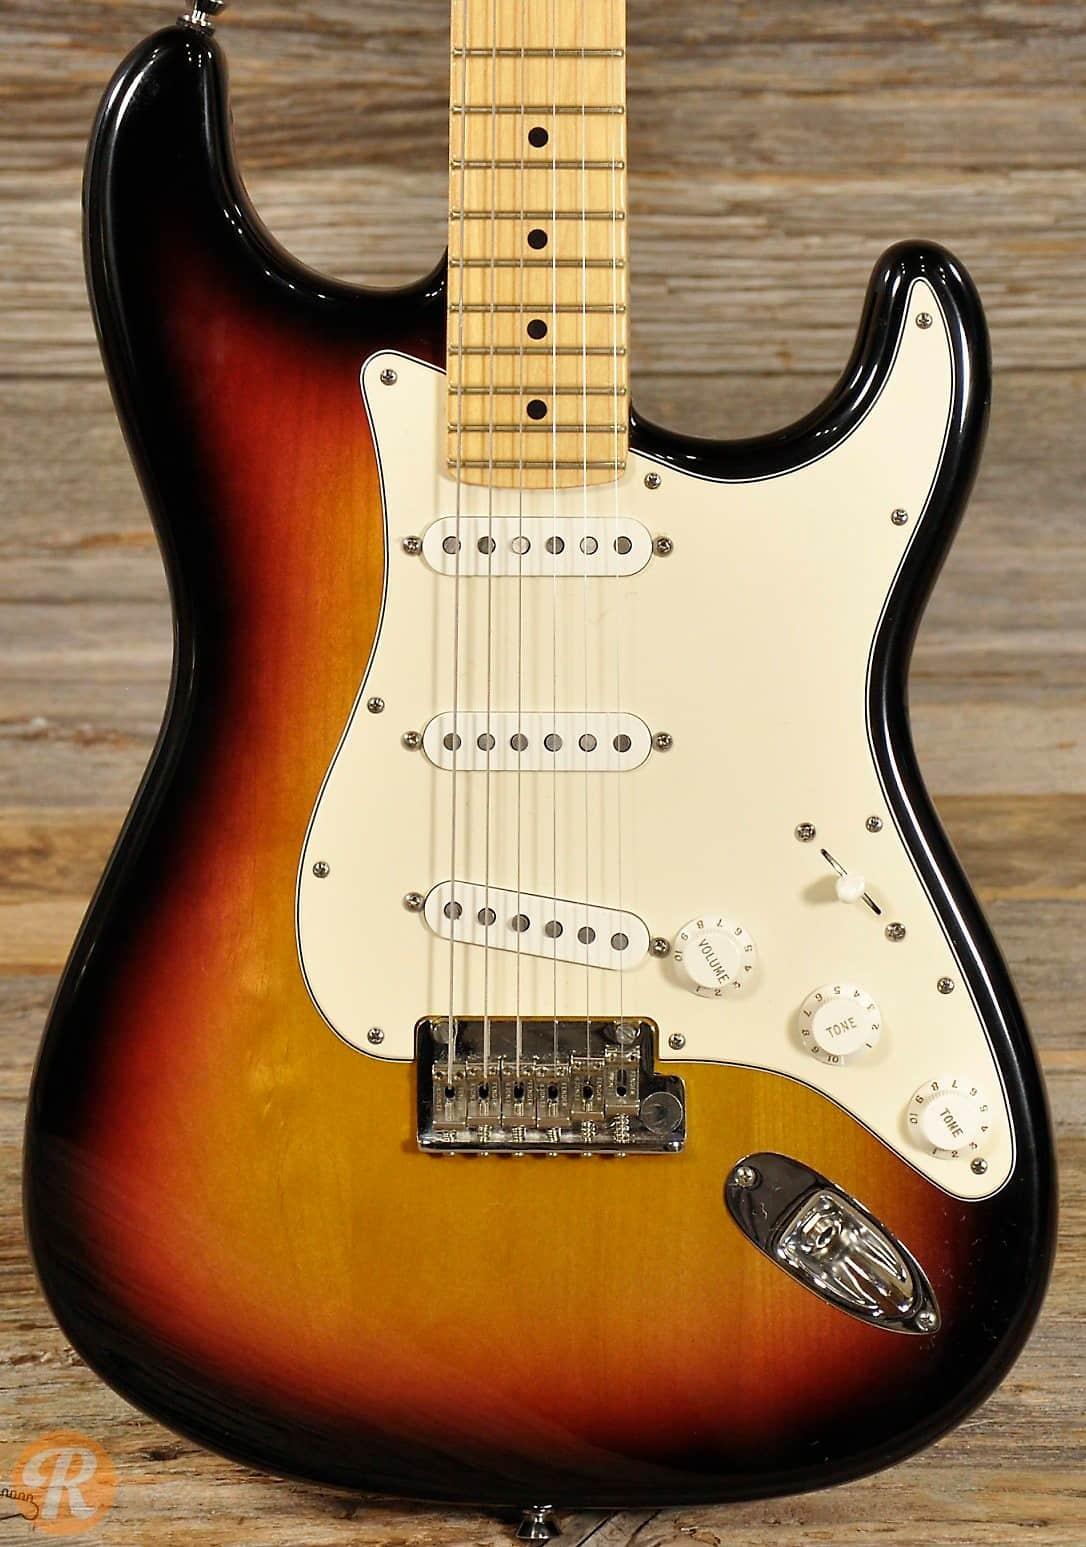 Fender American Standard Stratocaster 2009 Sunburst Price